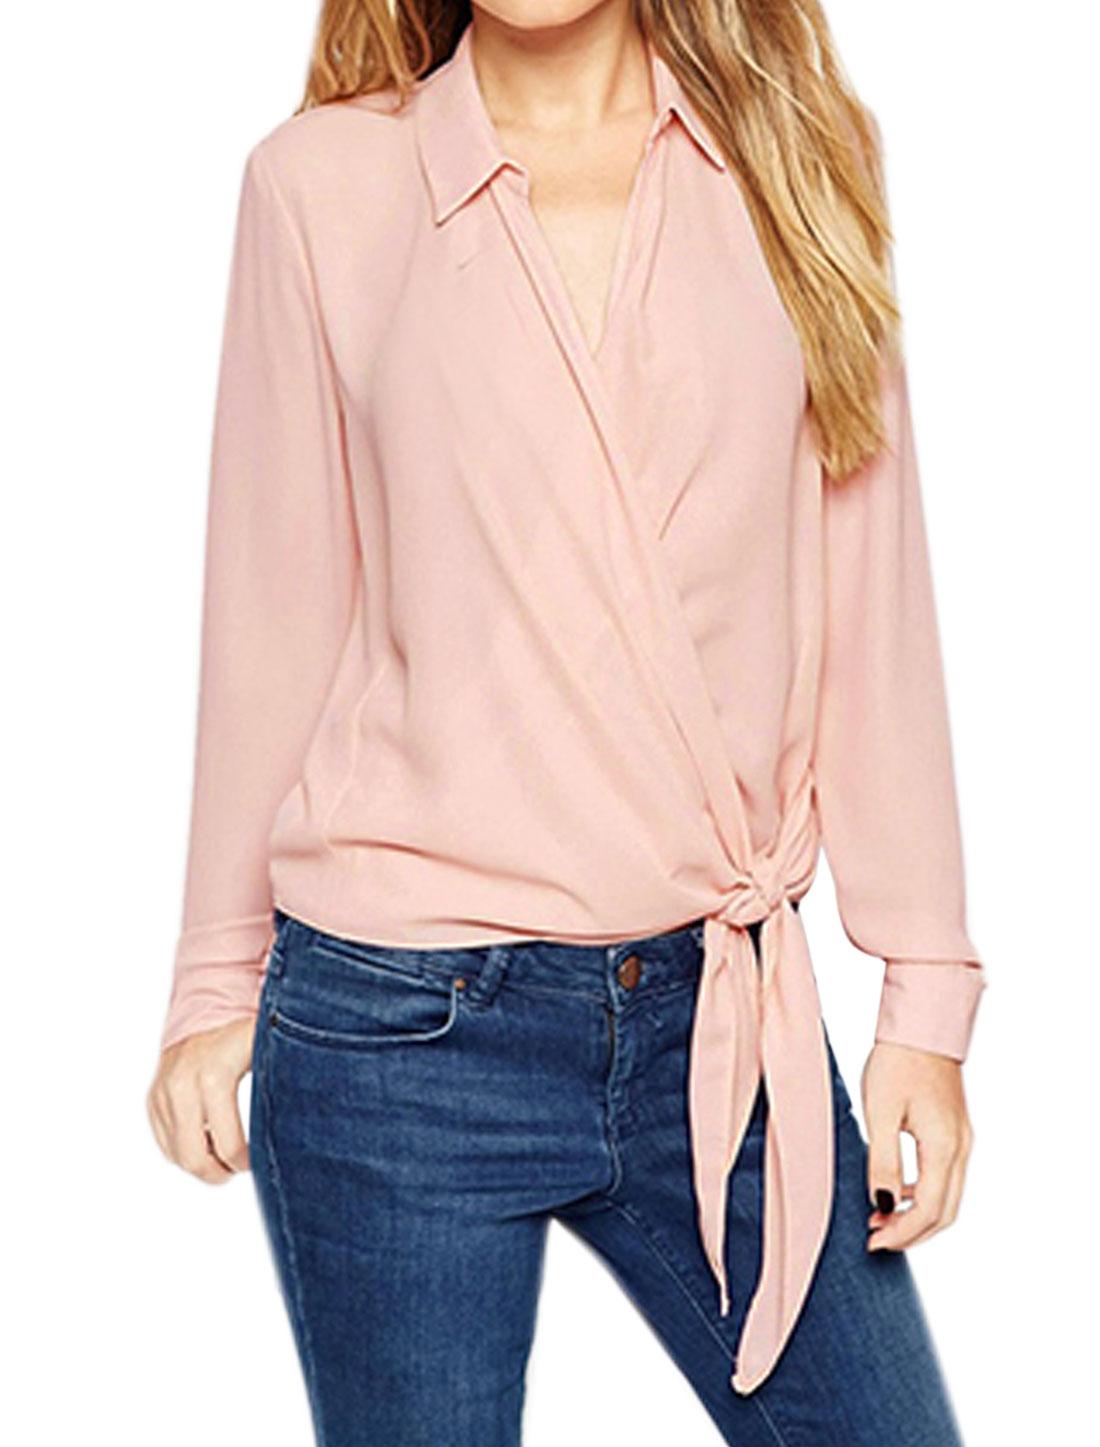 Women Point Collar Wrap Design Self Tie Hem Blouse Pink M